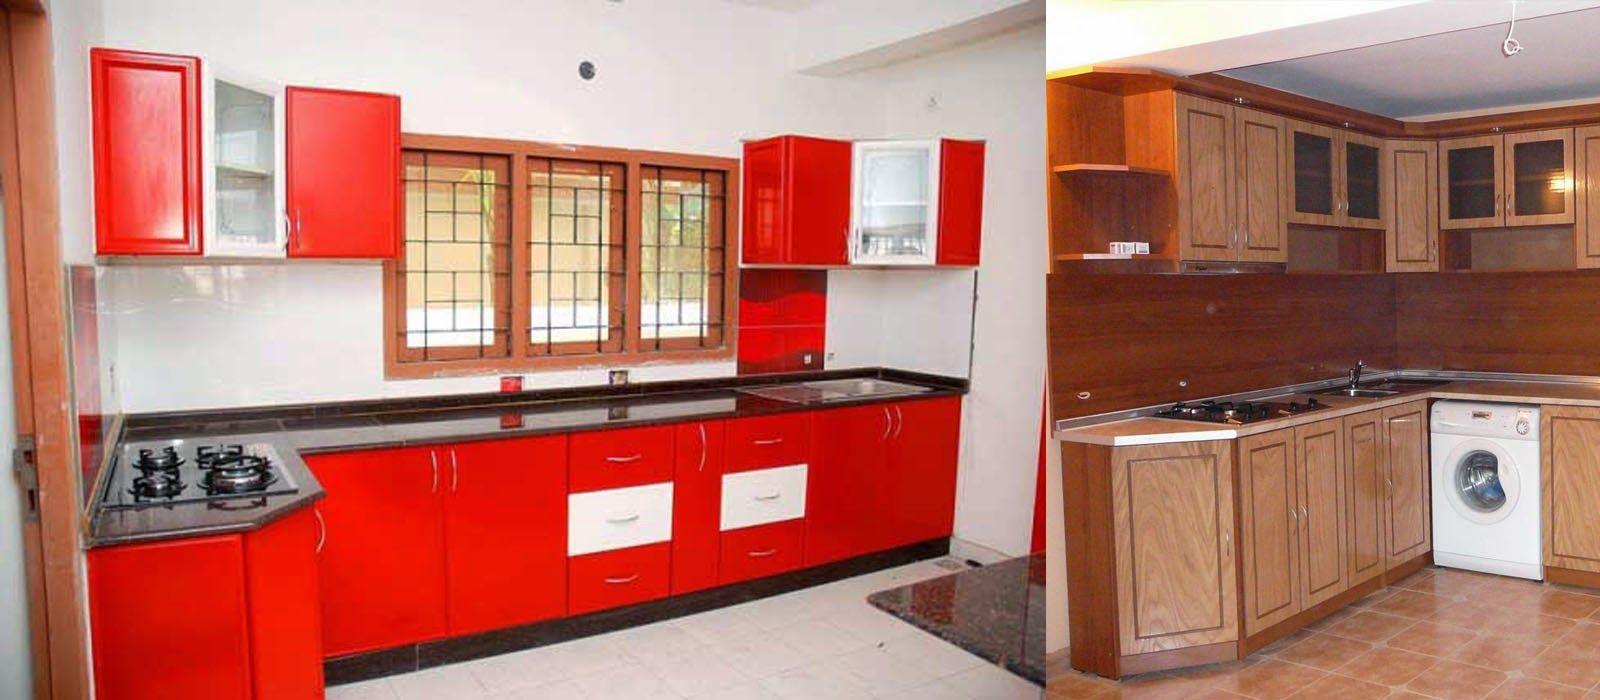 80 Kitchen Designs Kerala Style Ideas Aluminum Kitchen Cabinets Kitchen Inspiration Design Modern Kitchen Design